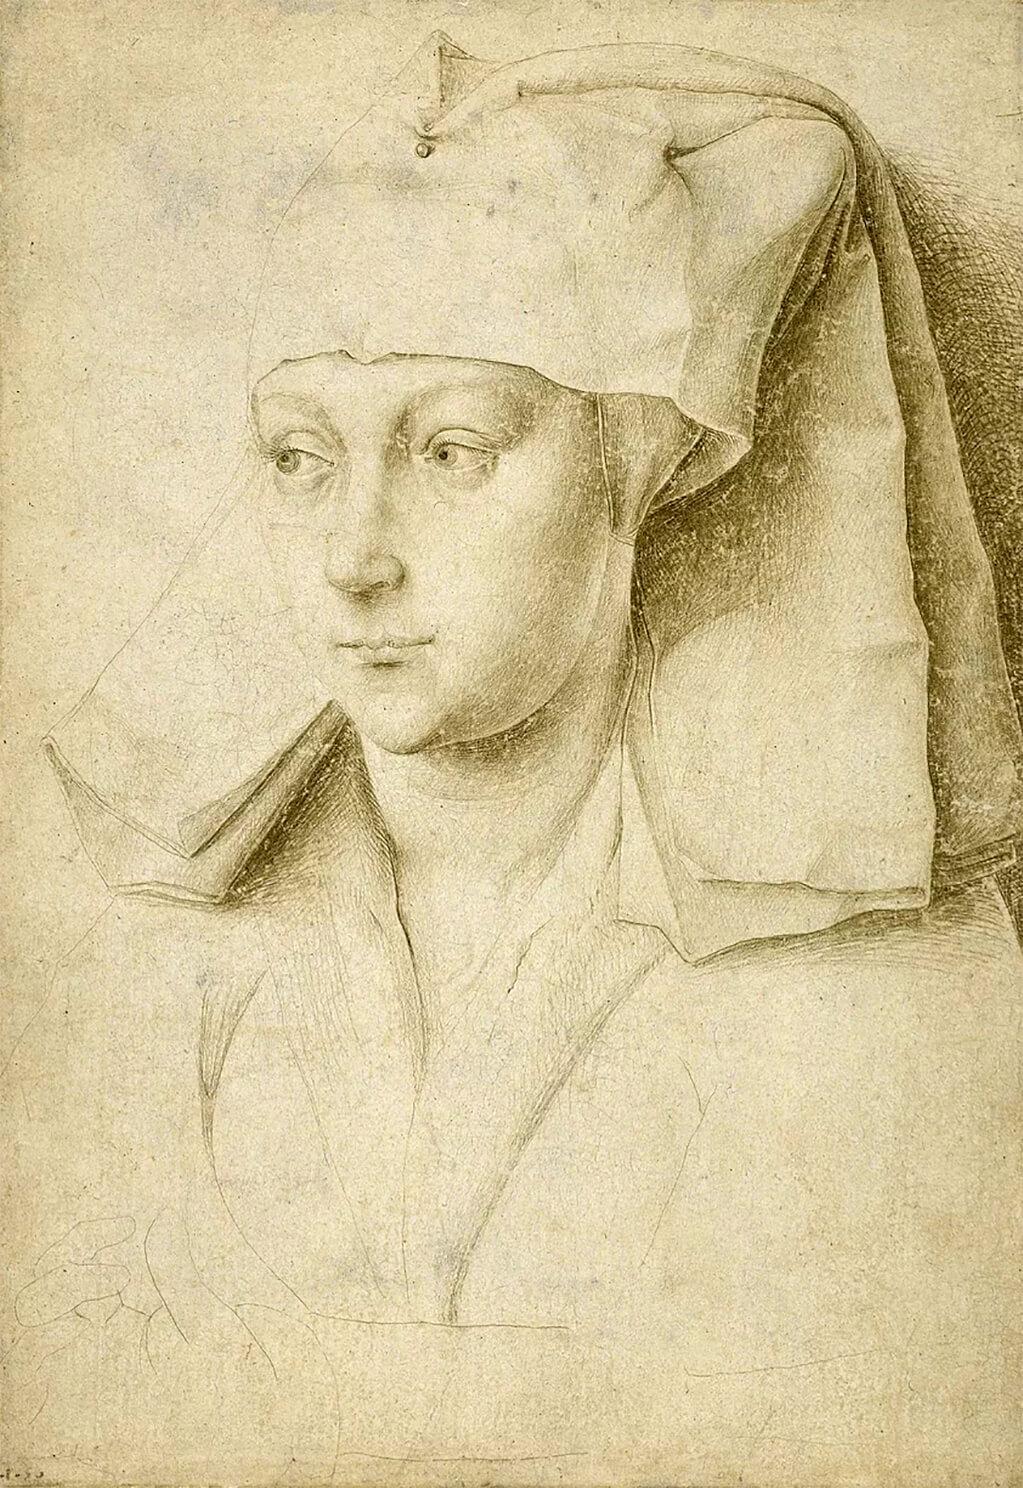 Rogier van der Weyden, Portrait of an Unknown Young Woman, c.1435; British Museum